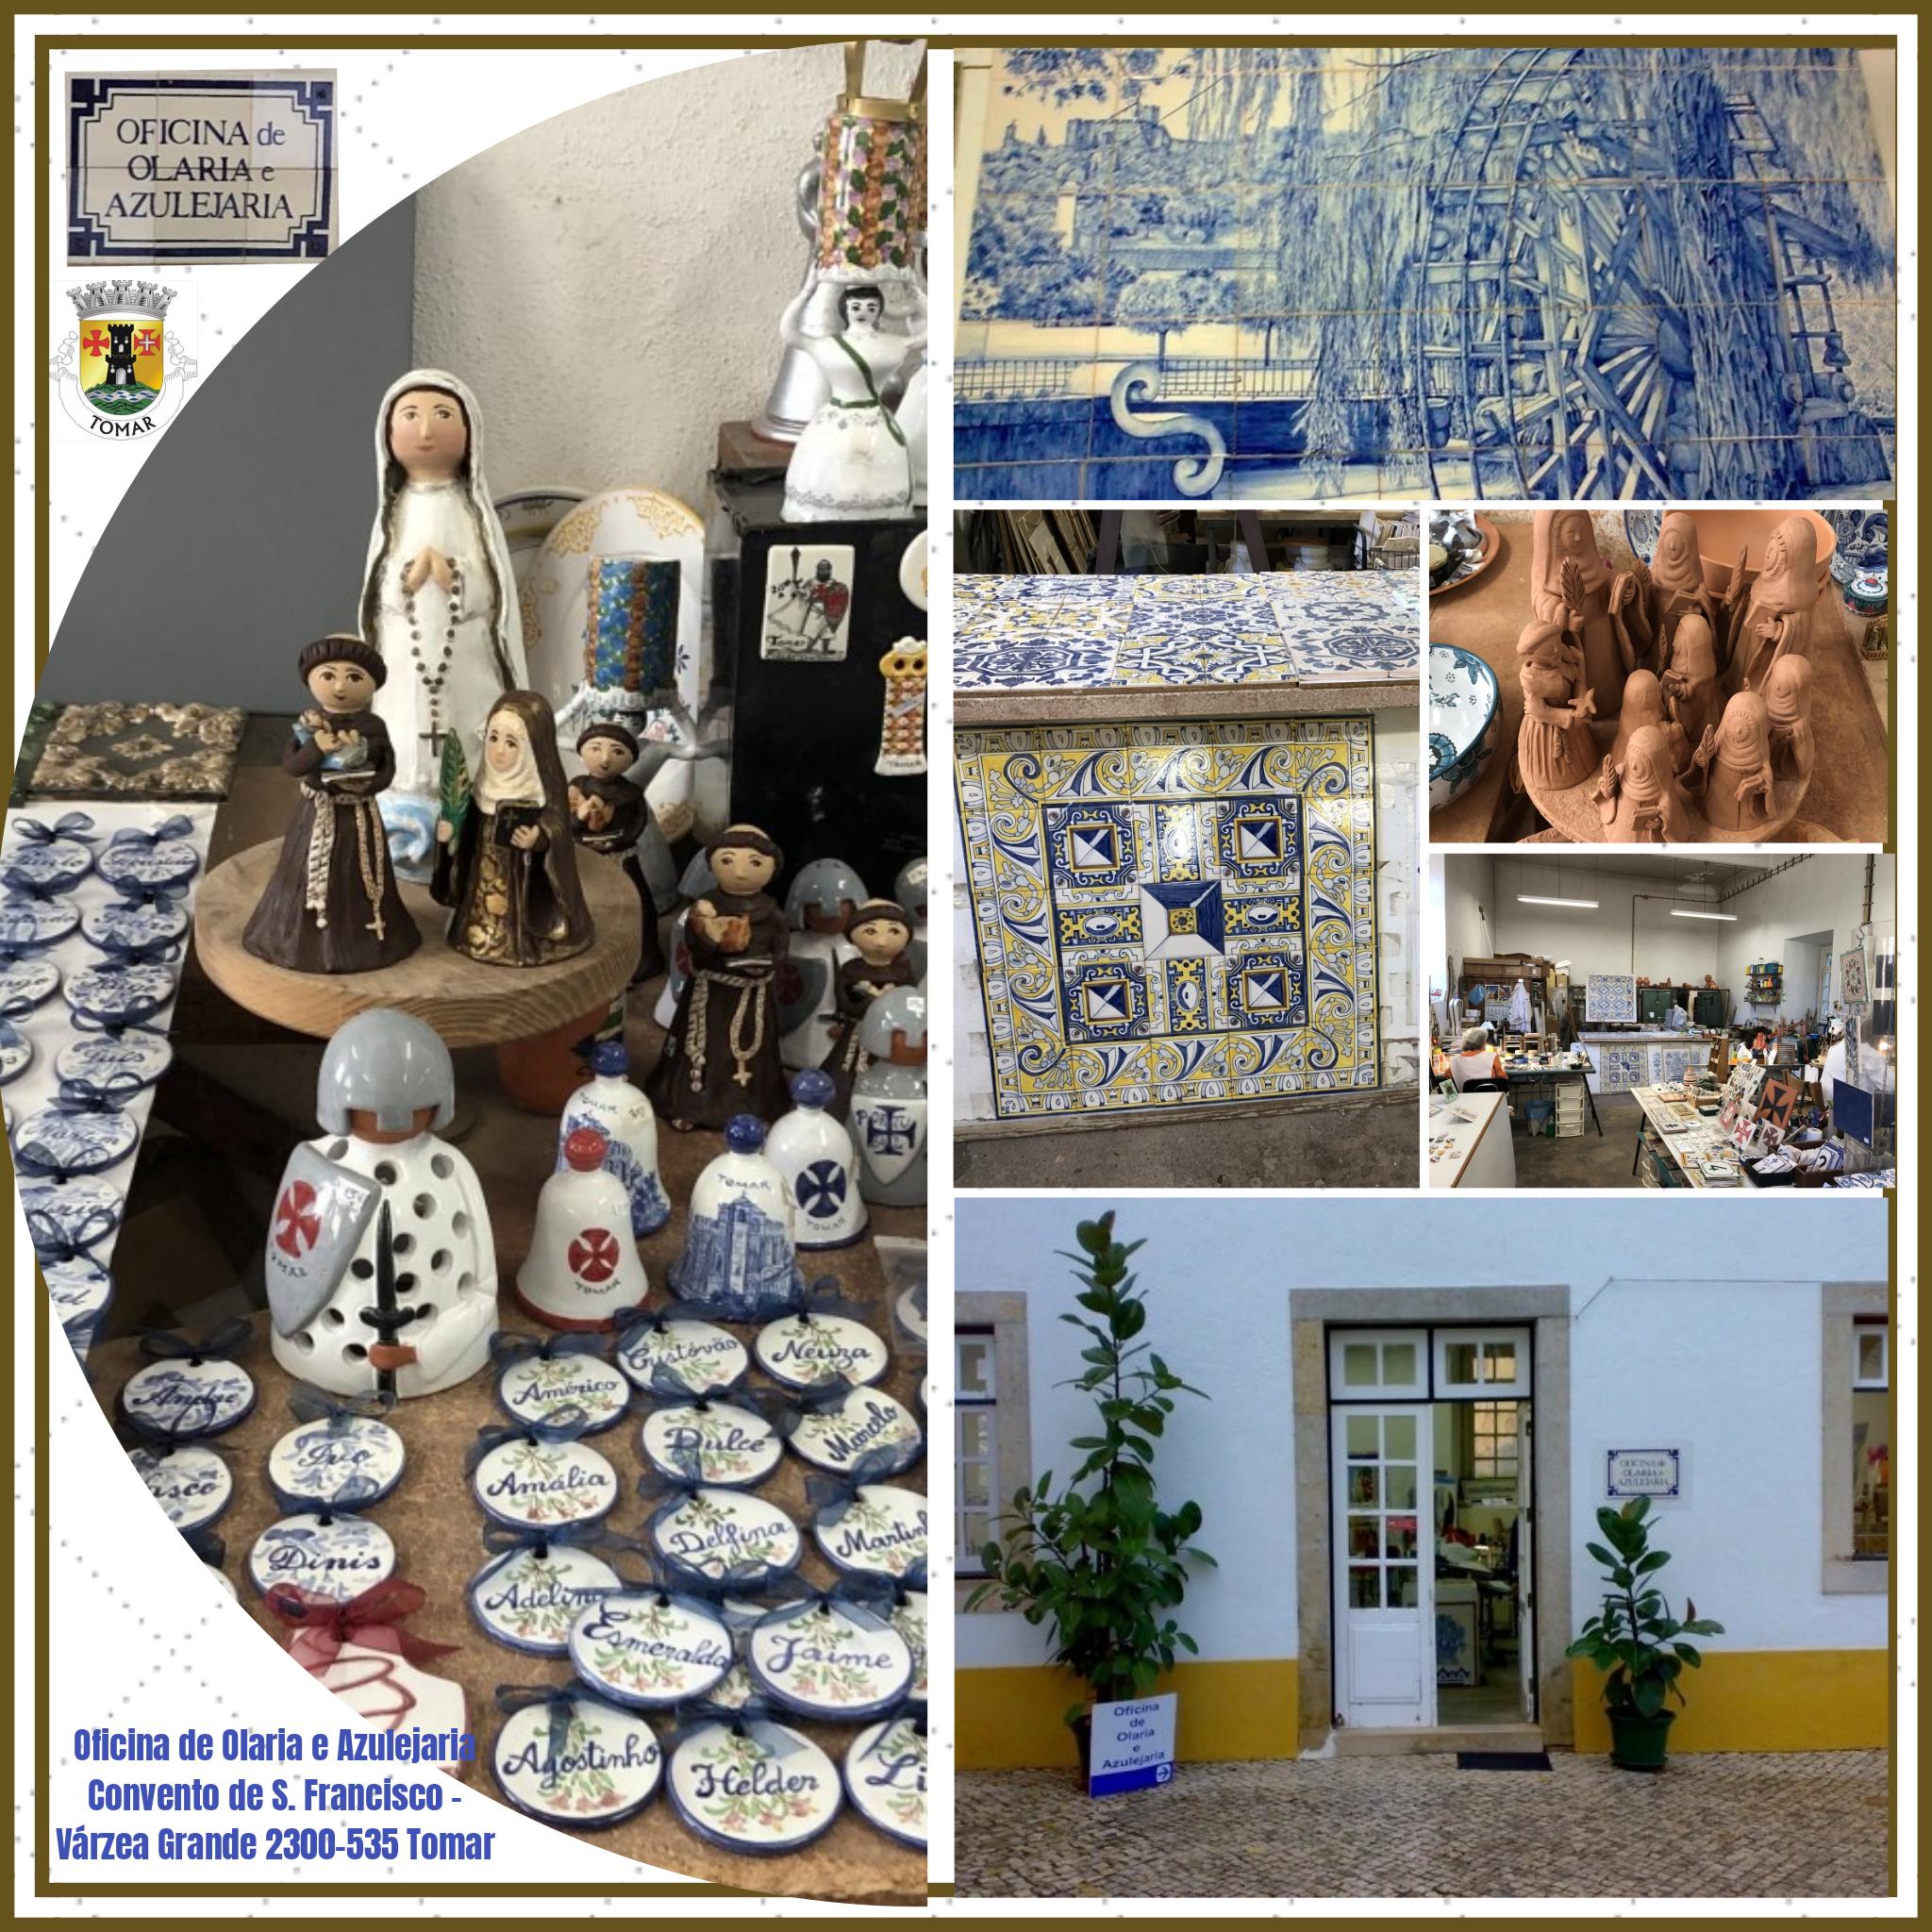 Oficina de Olaria e Azulejaria Convento de S. Francisco - Várzea Grande 2300-535 Tomar